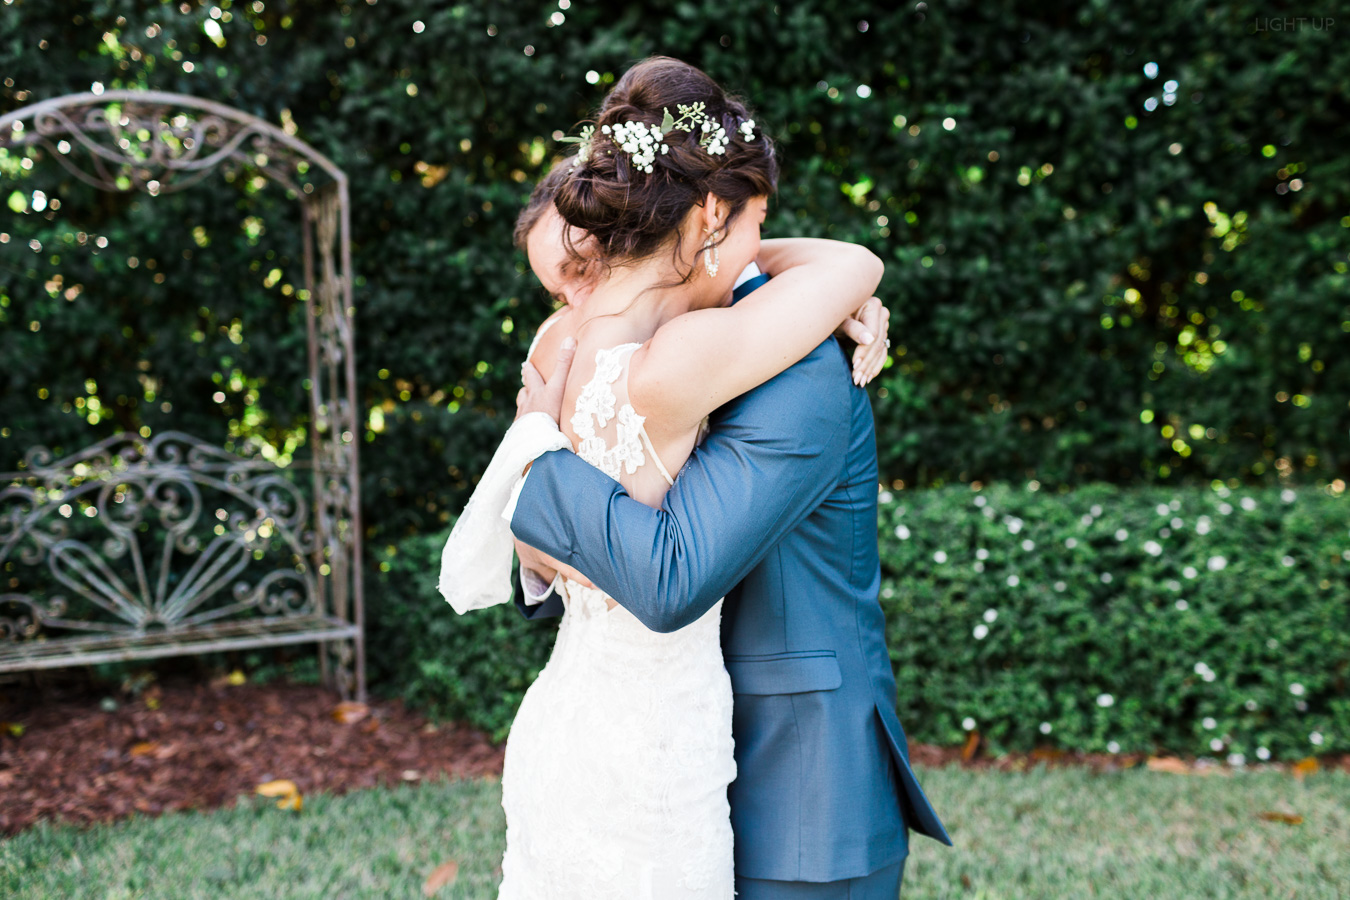 Wedding-photographer-orlando-31.jpg